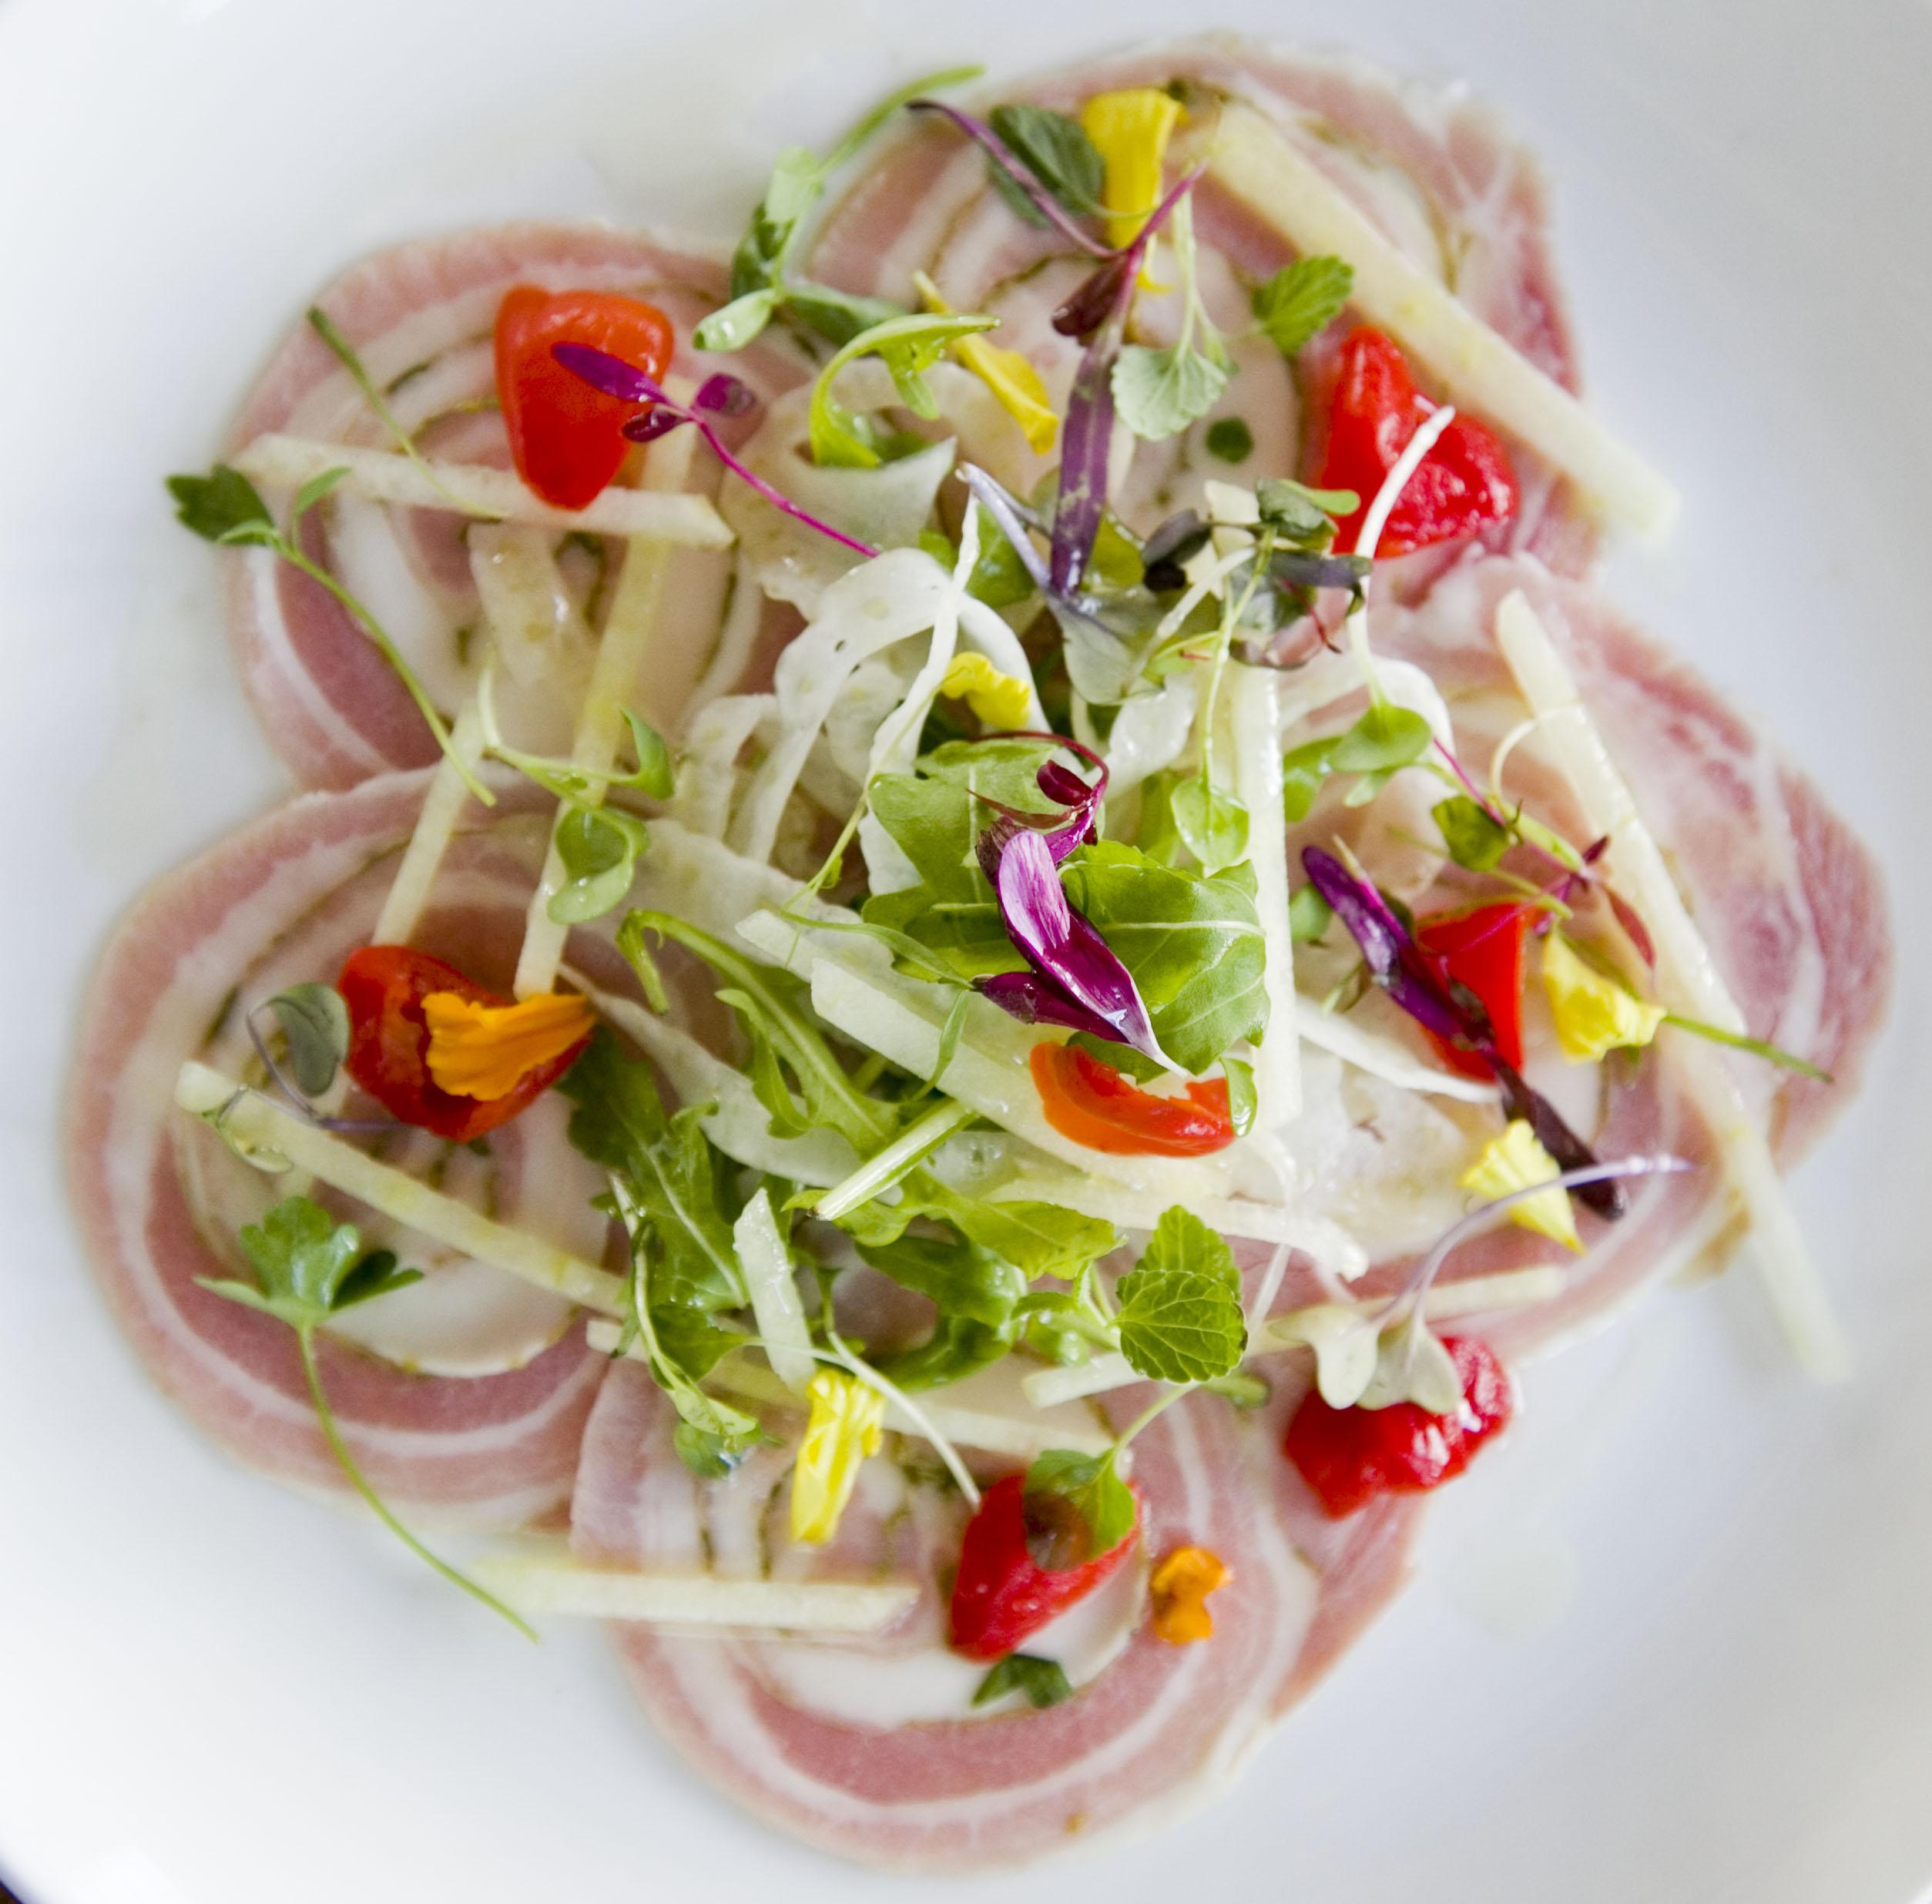 Catch Cayman Salad